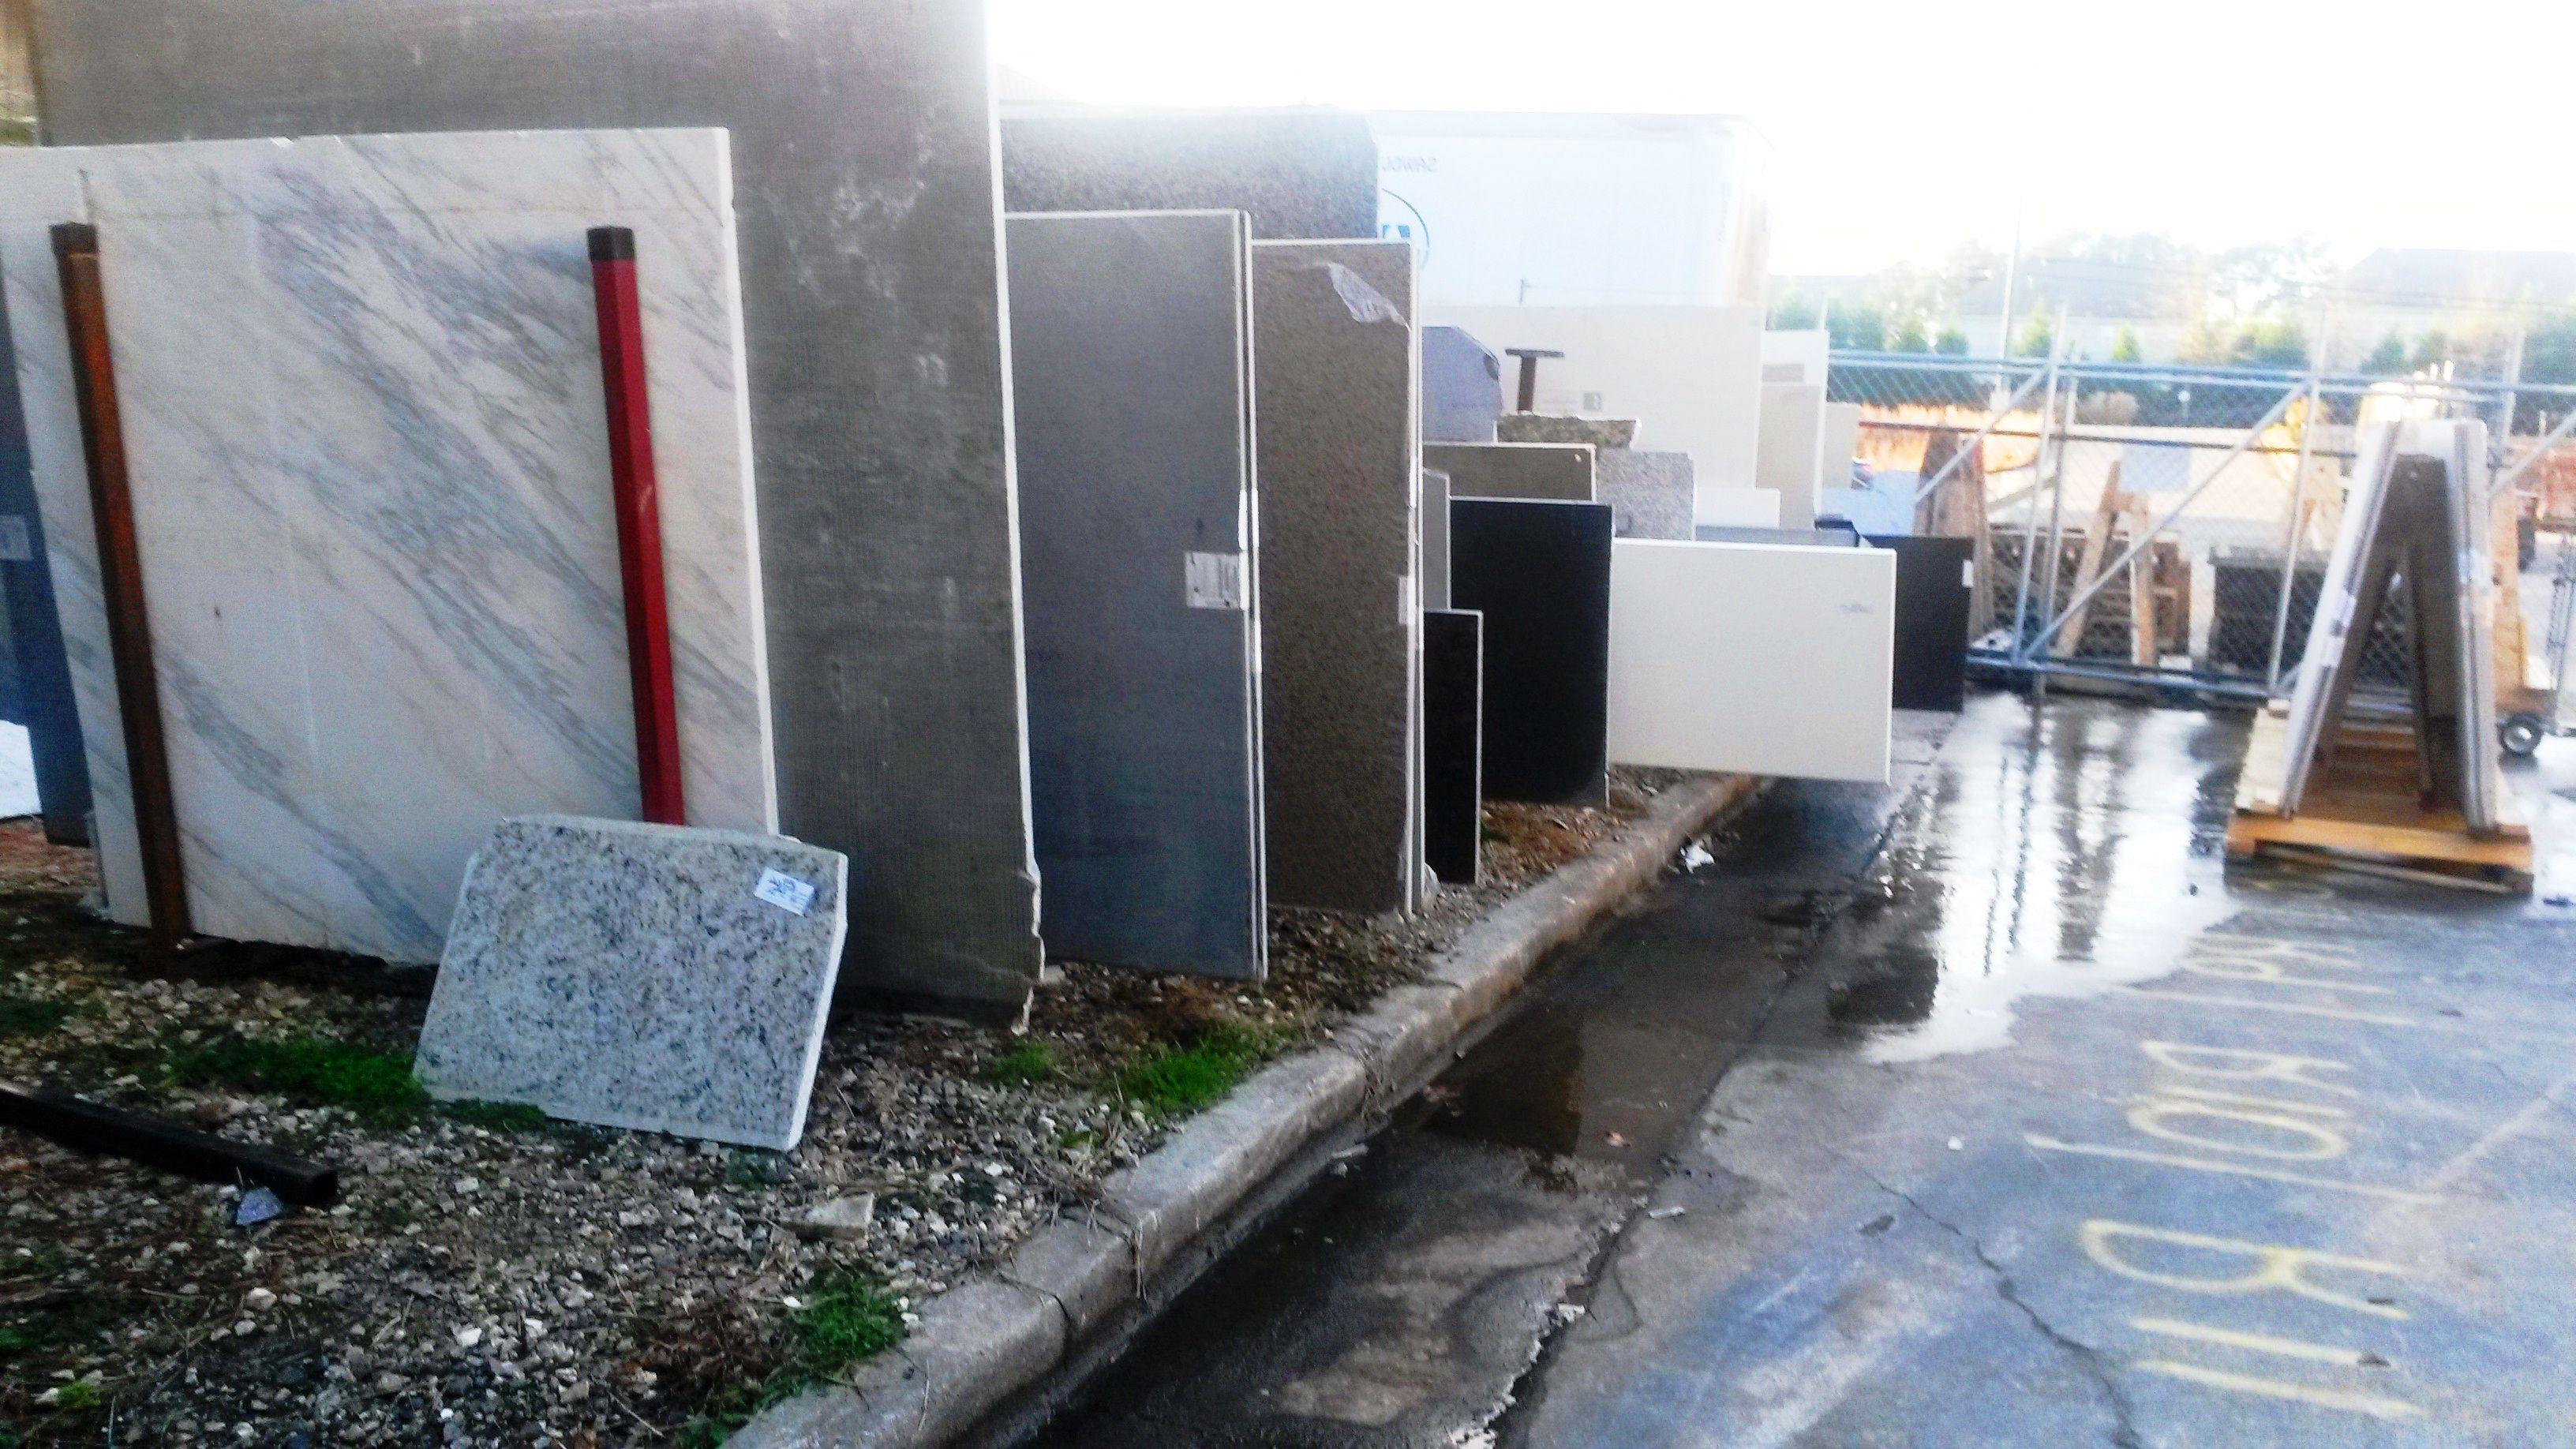 Discount Granite Countertops In Atlanta: Cheap Granite Remnants And Left  Over Pieces. Overstock Granite Priced For Liquidation